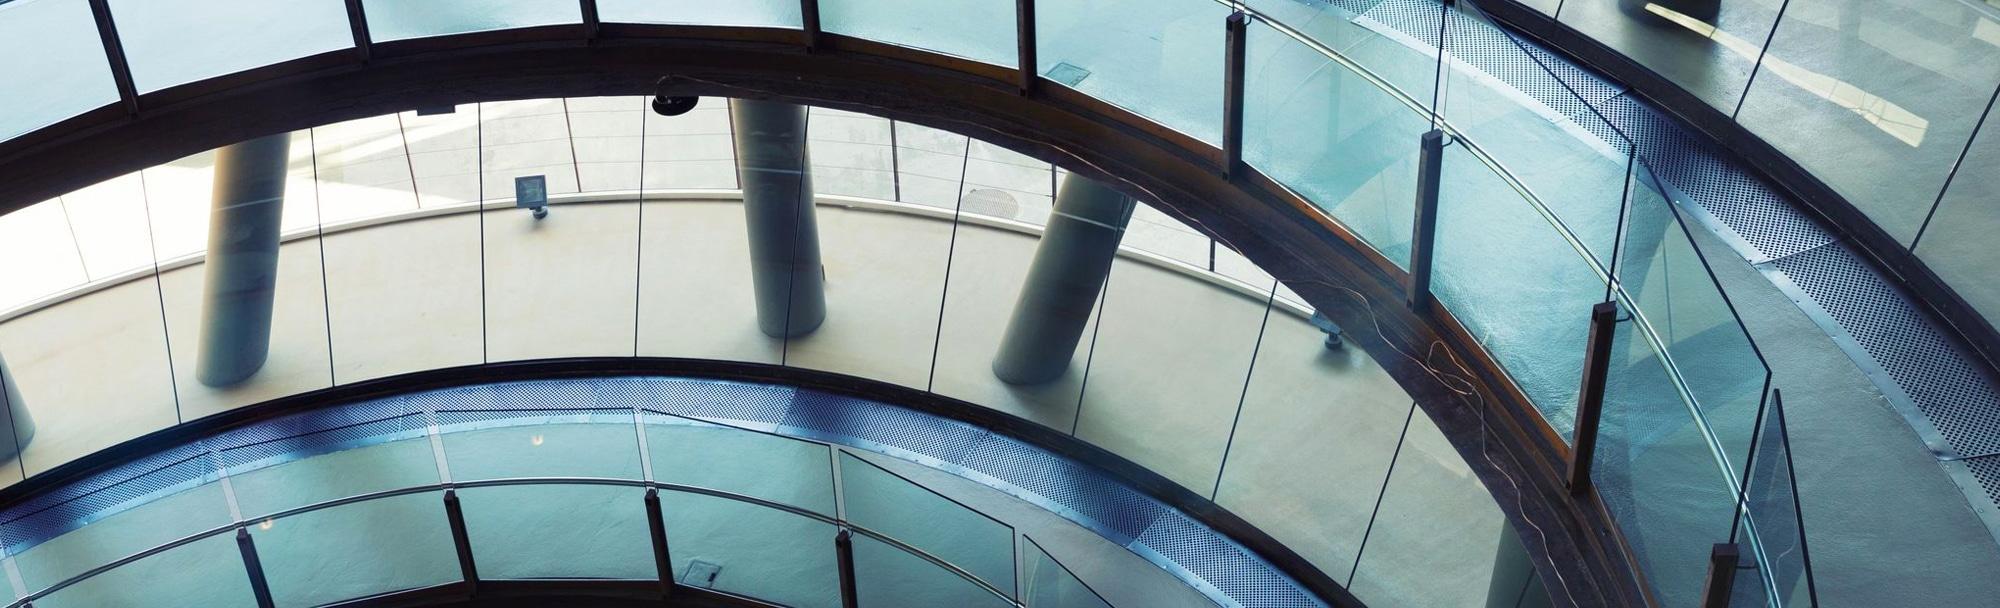 close-up of an office building atrium walkway